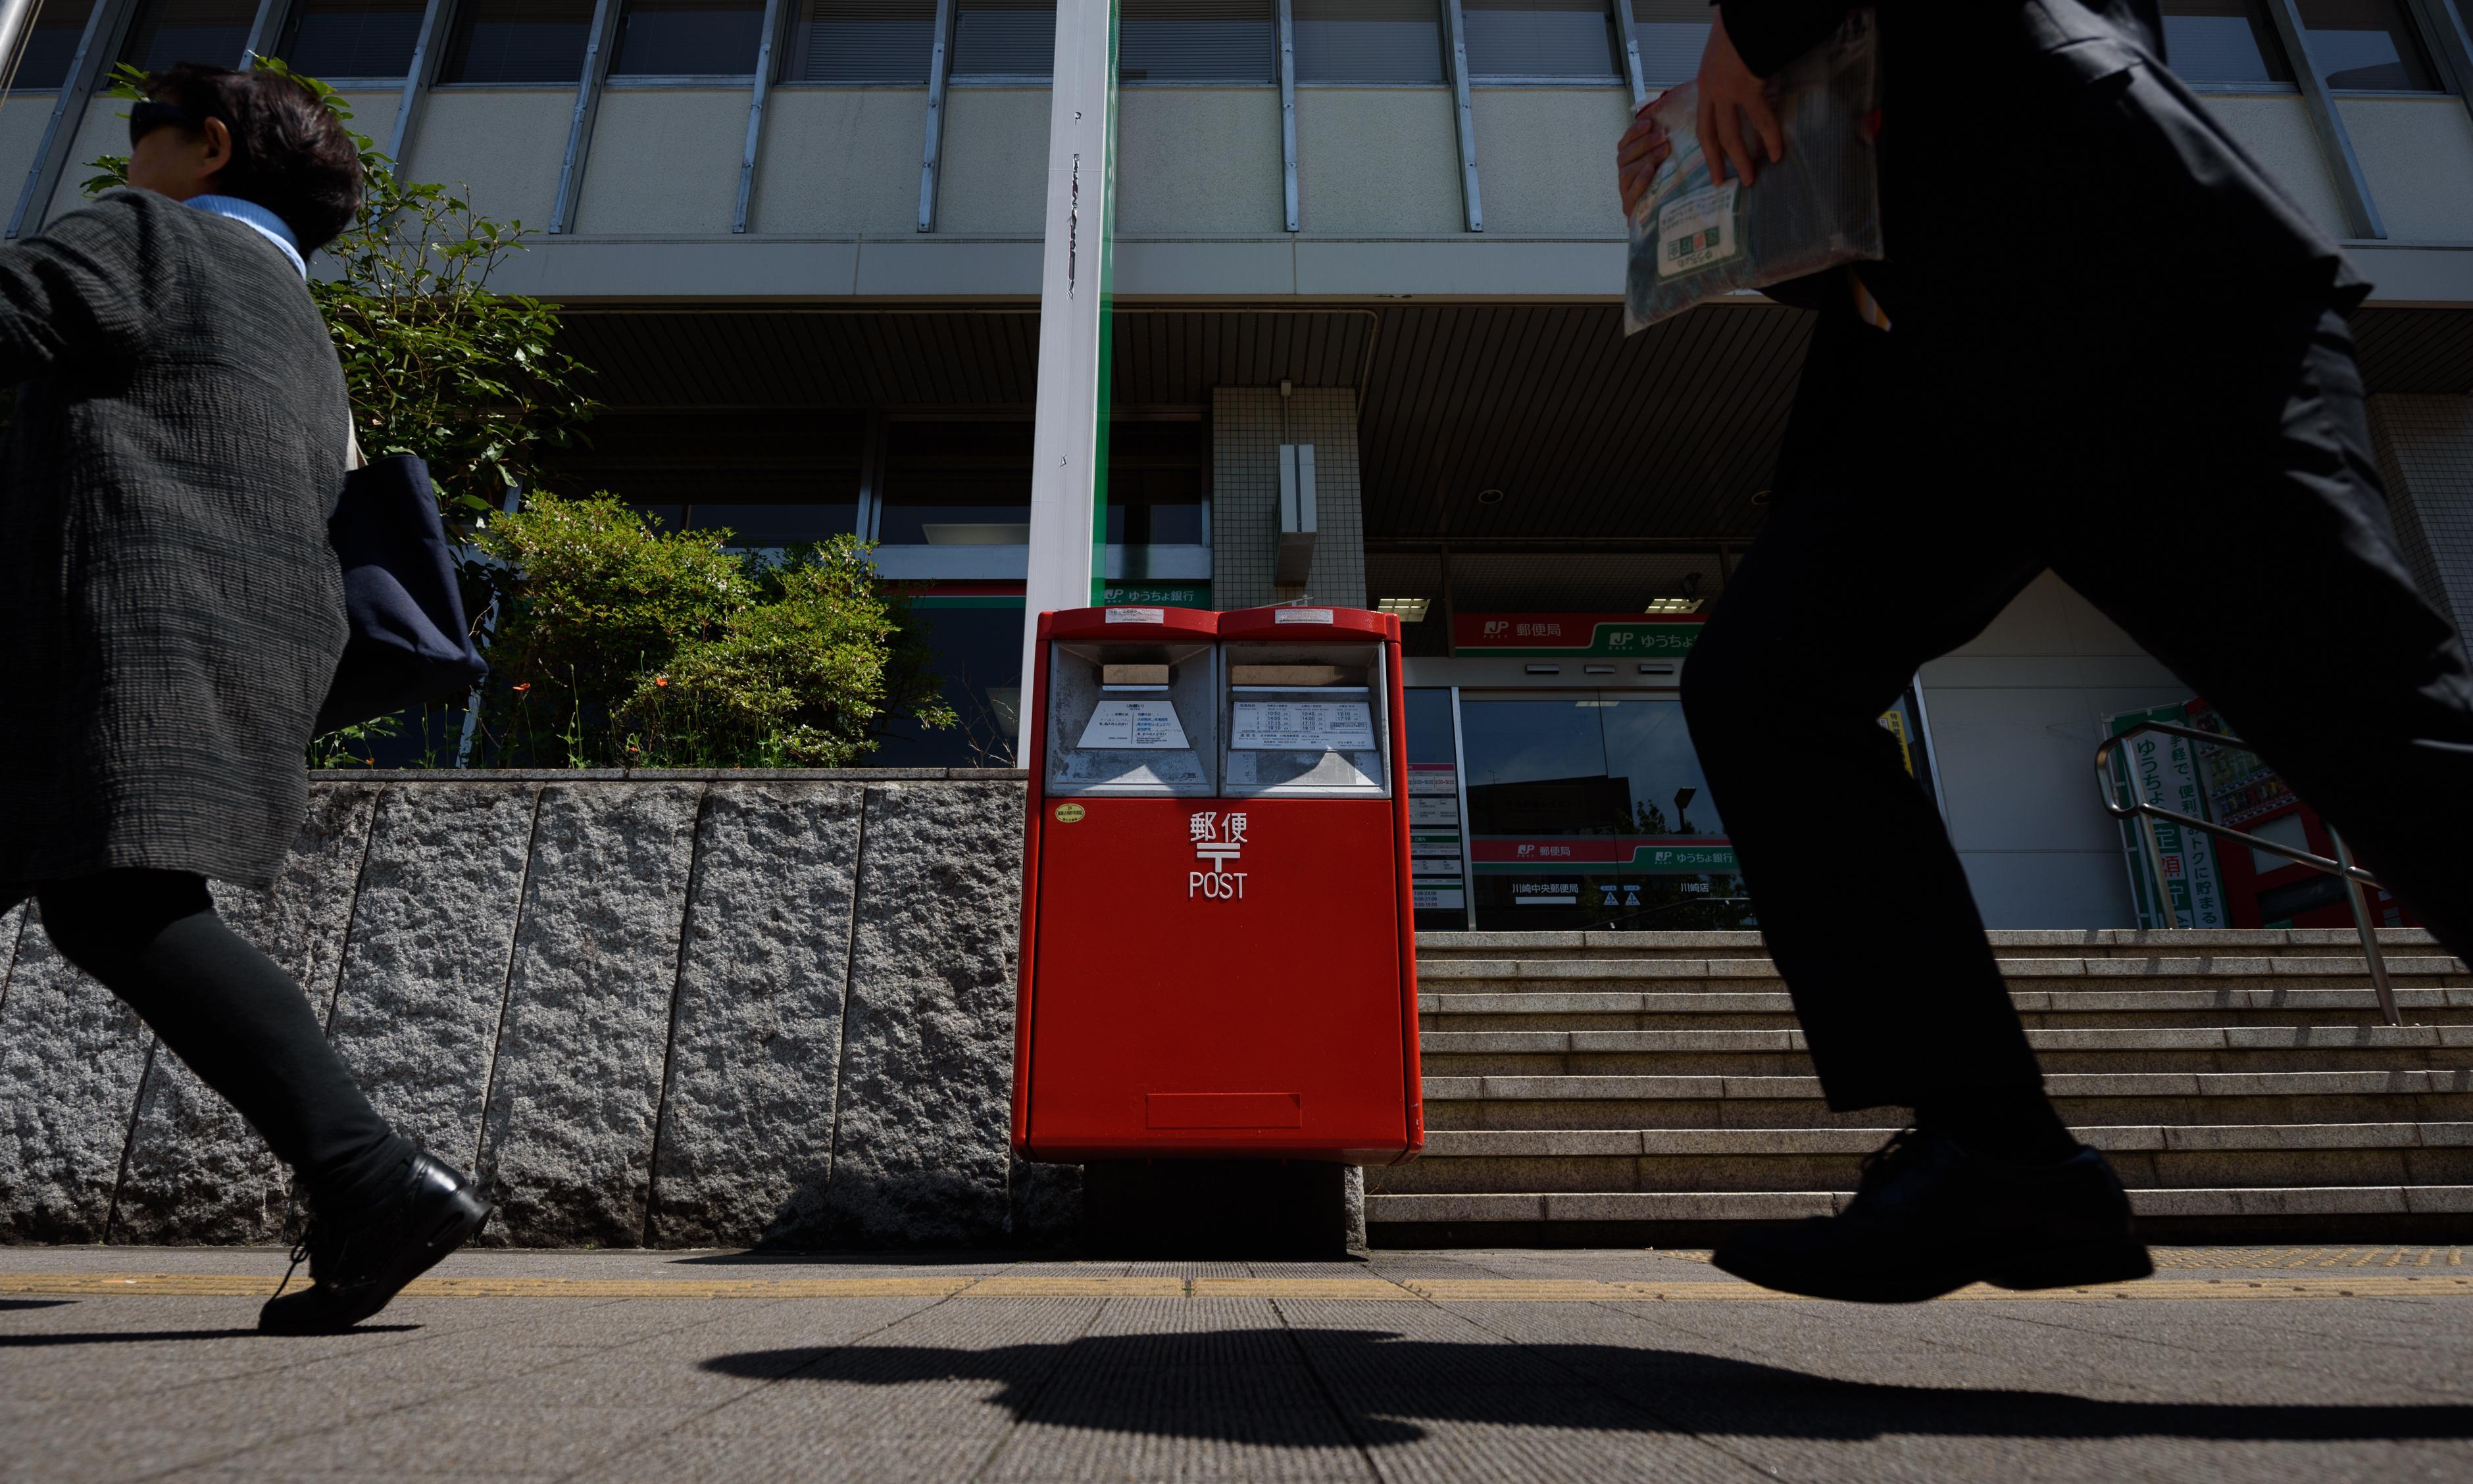 Japanese postal worker hoarded 24,000 undelivered items